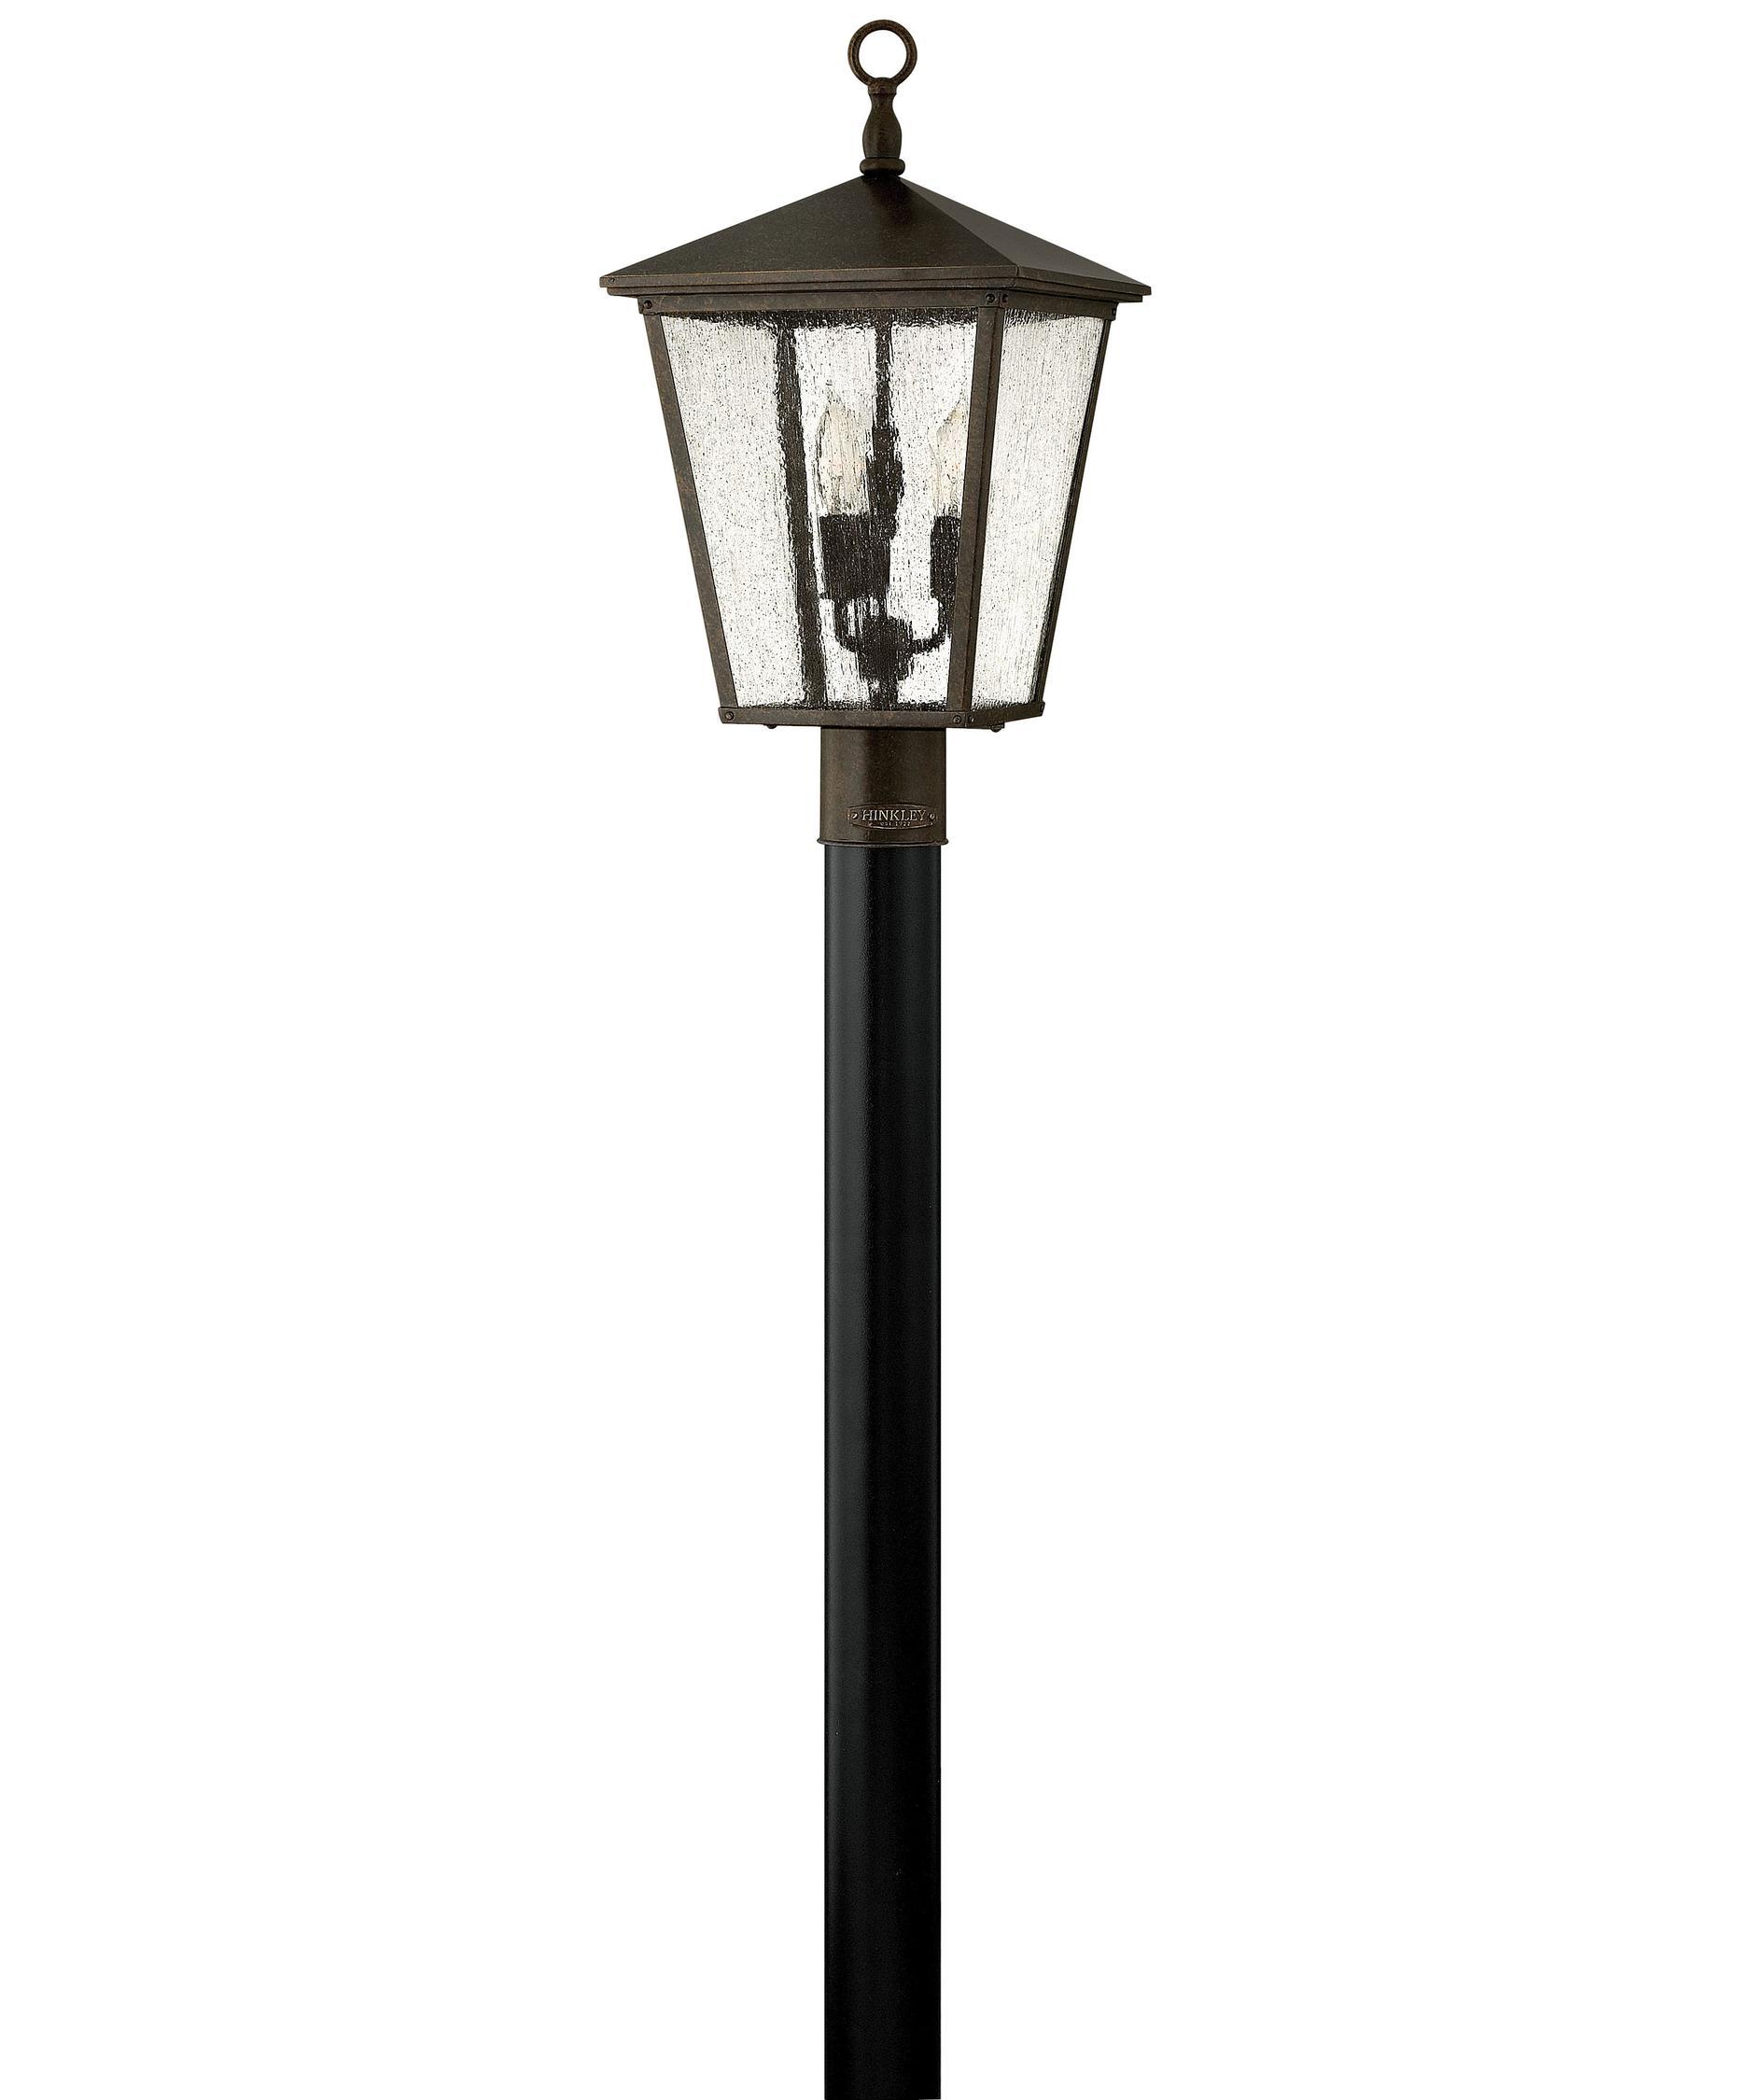 lighting 1431 trellis 3 light outdoor post lamp capitol lighting. Black Bedroom Furniture Sets. Home Design Ideas